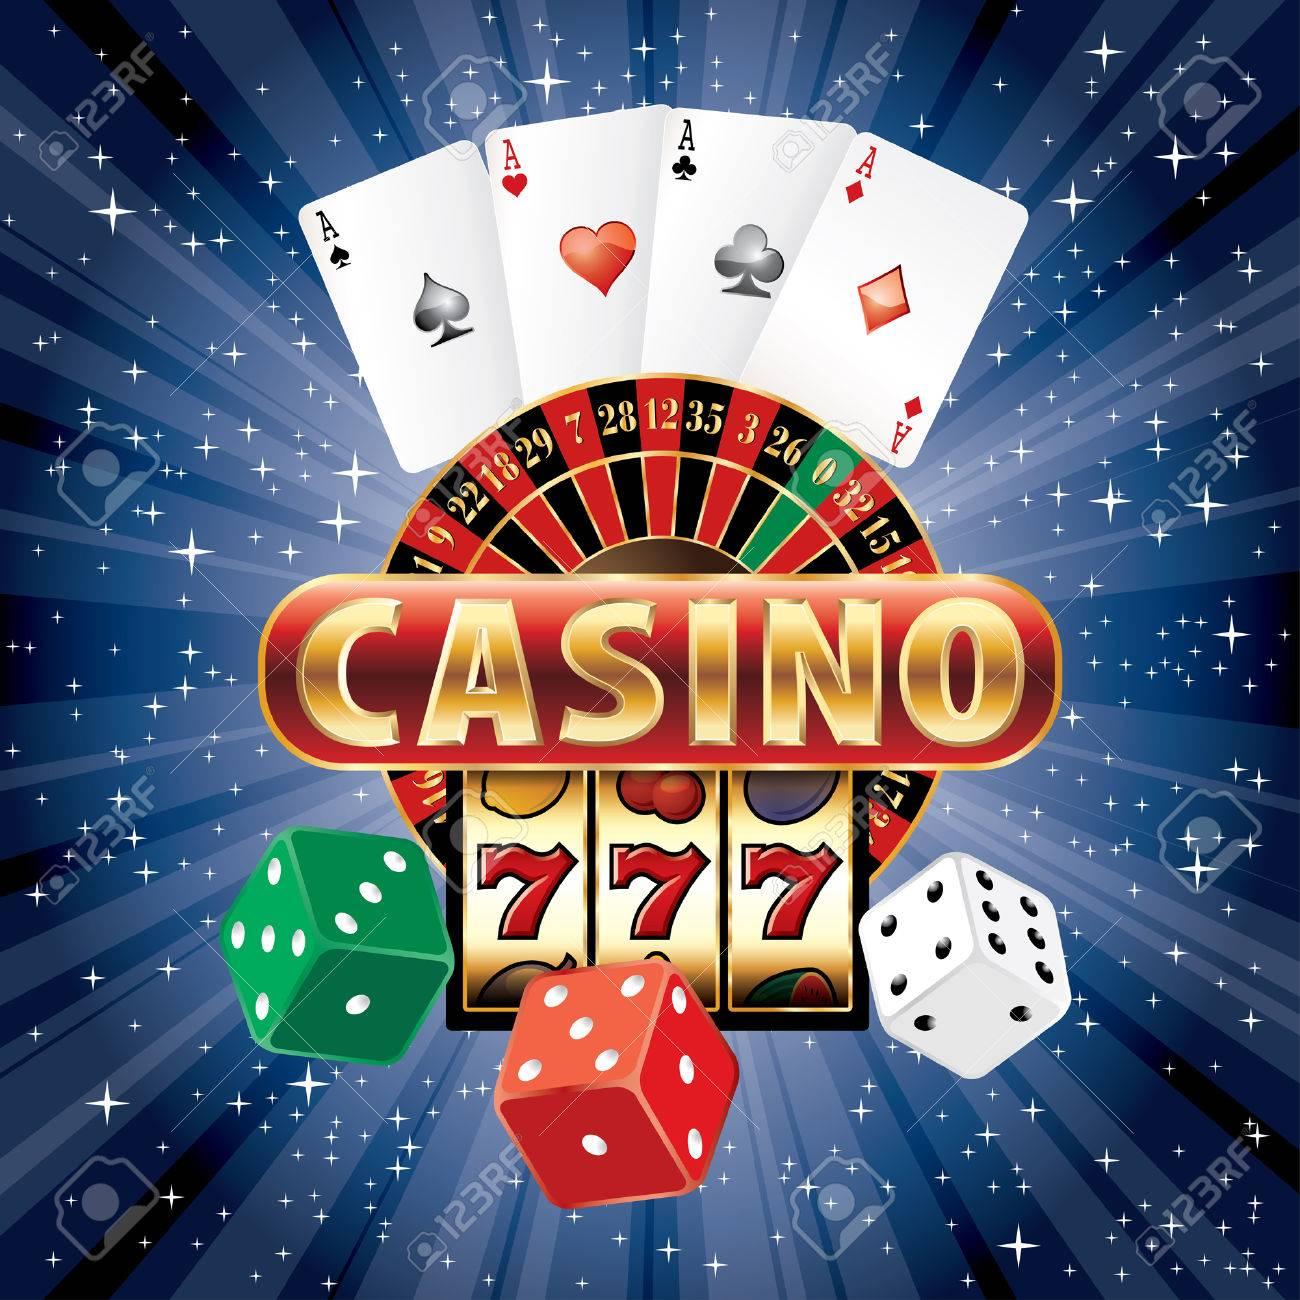 gambling casino elements on blue starry night - 33047171